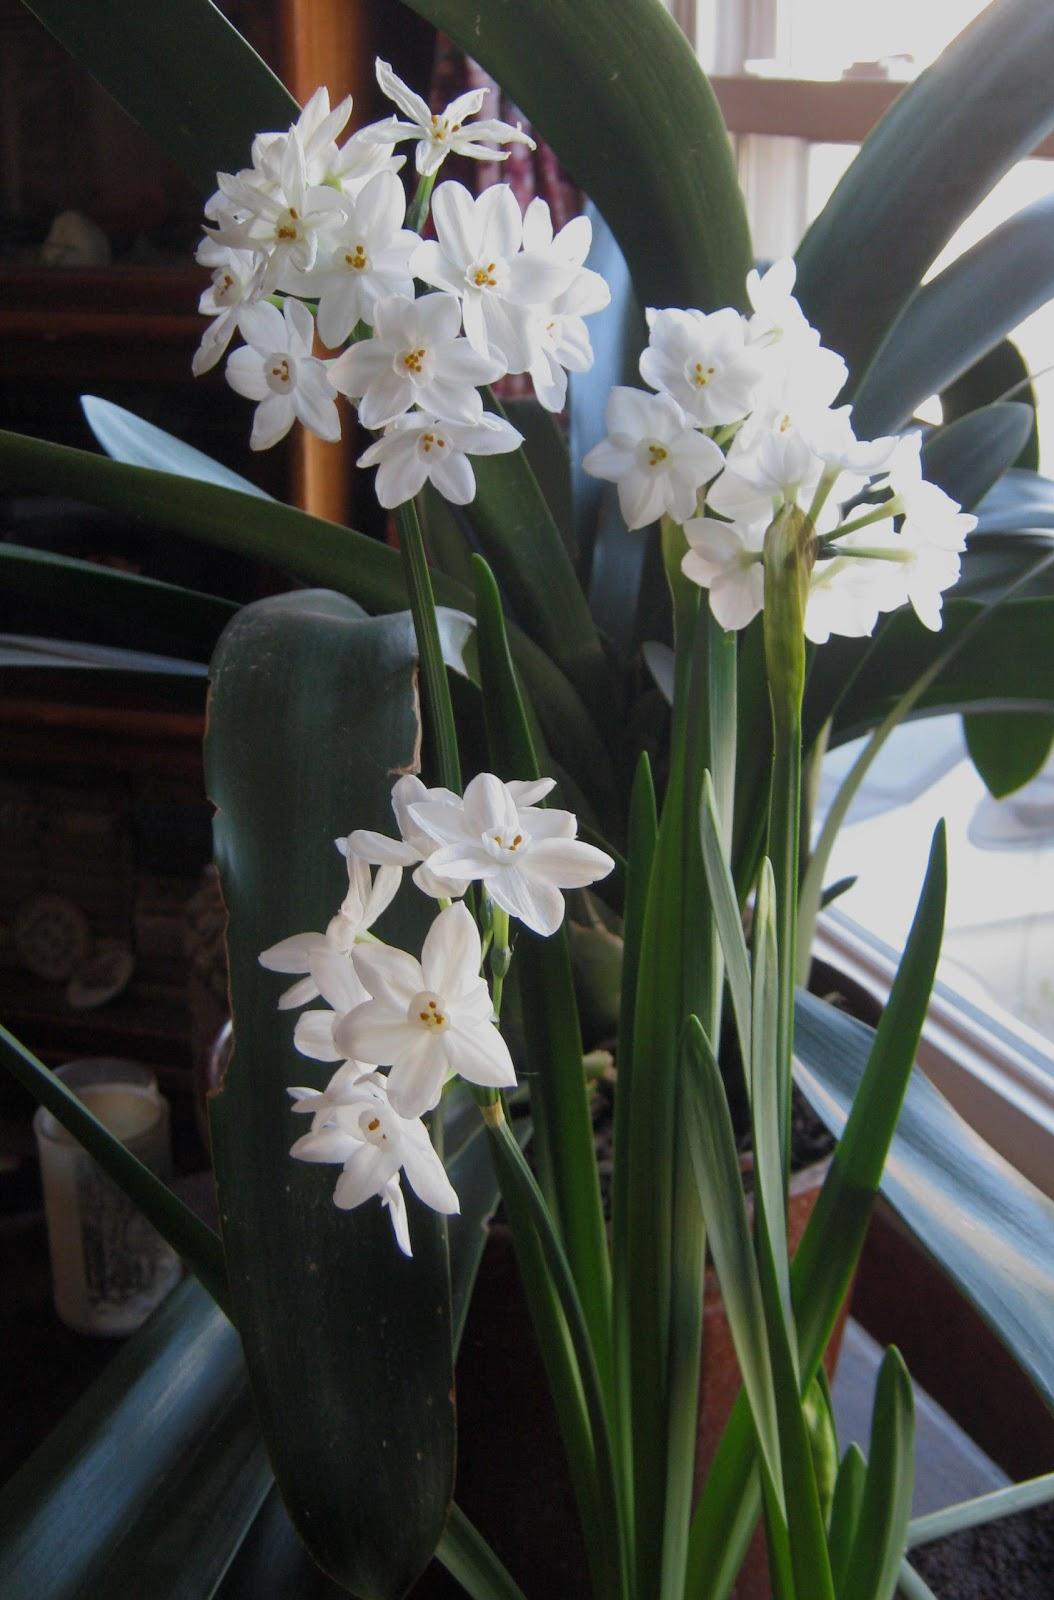 Sorta Fabulous Paperwhites Beautiful White Flowers That Smell Bad